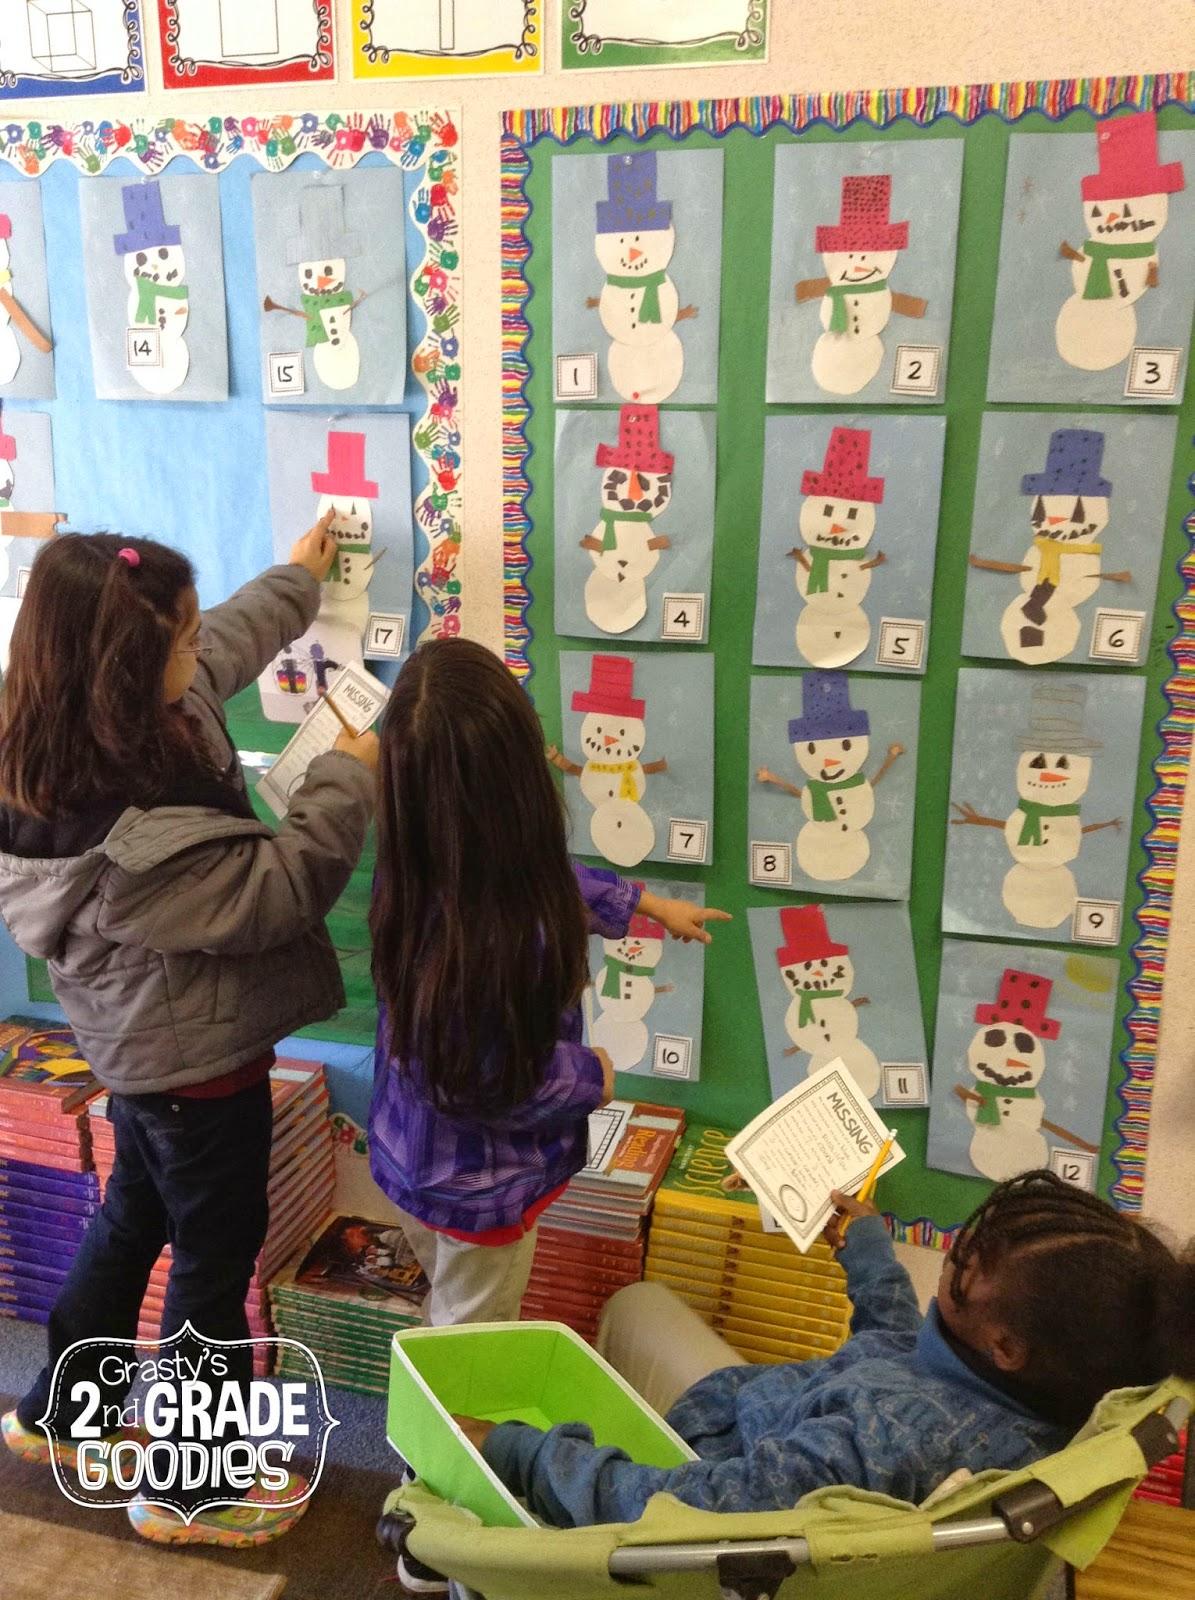 Grasty S 2nd Grade Goo S Fun With Snowmen